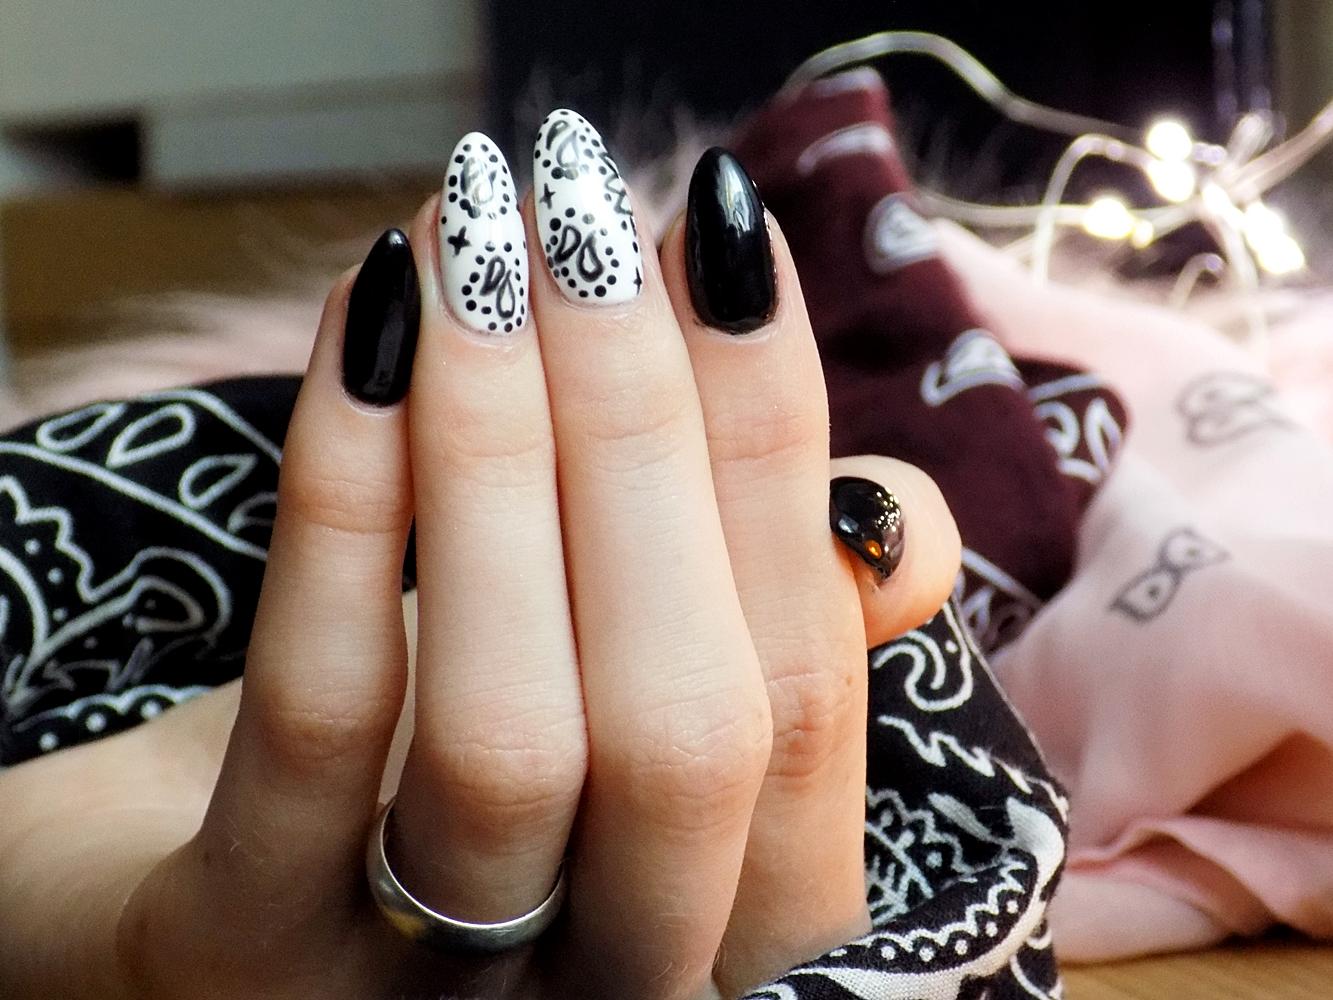 Paznokcie inspirowane bandaną   Zdobienie paznokci - Ksanaru